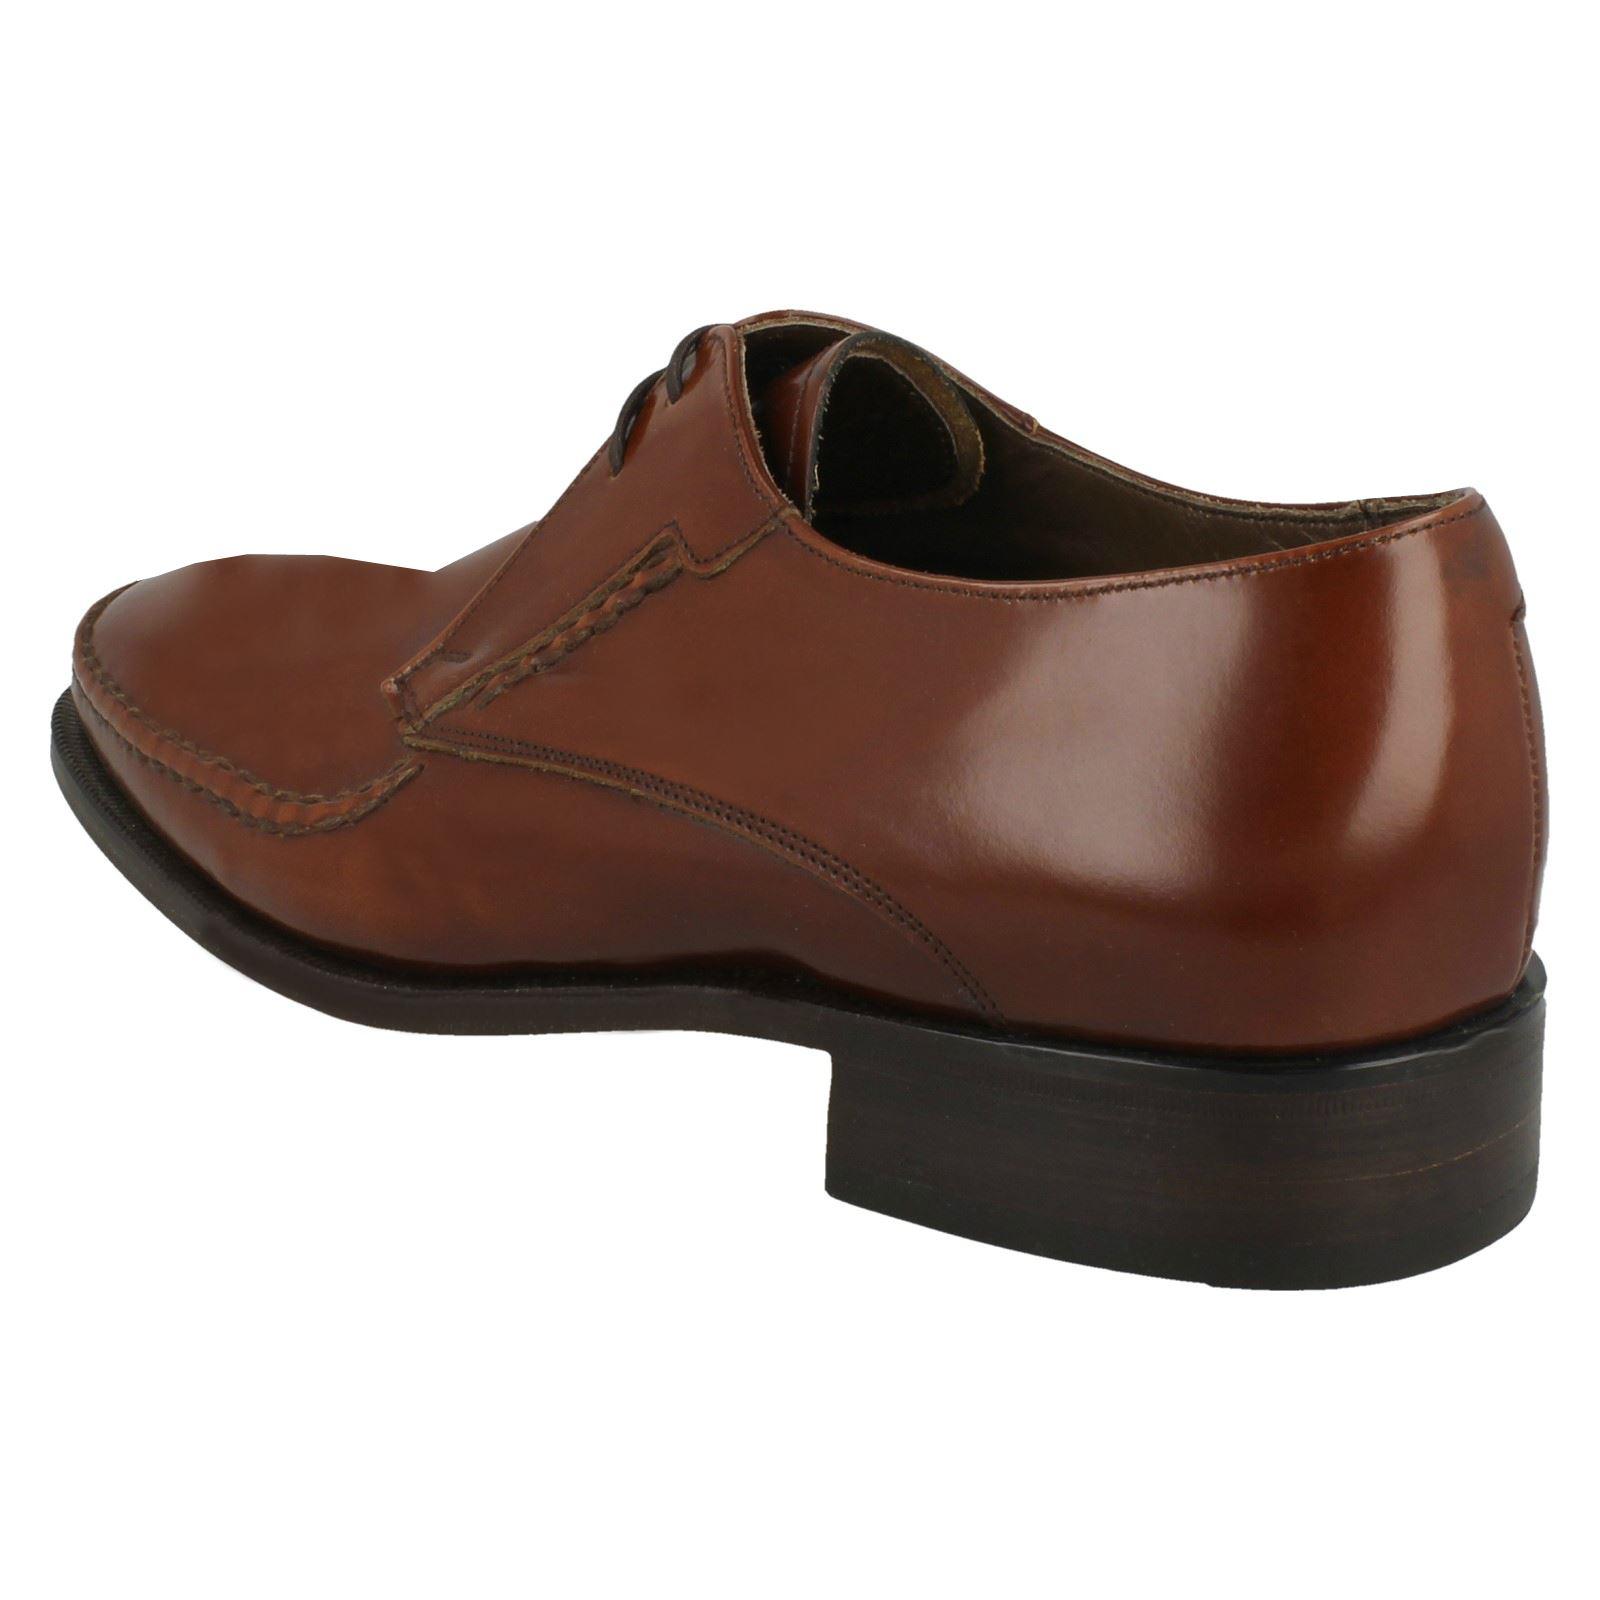 056bf9c2 Barker-Mens-Formal-Shoes-Pitney thumbnail 13